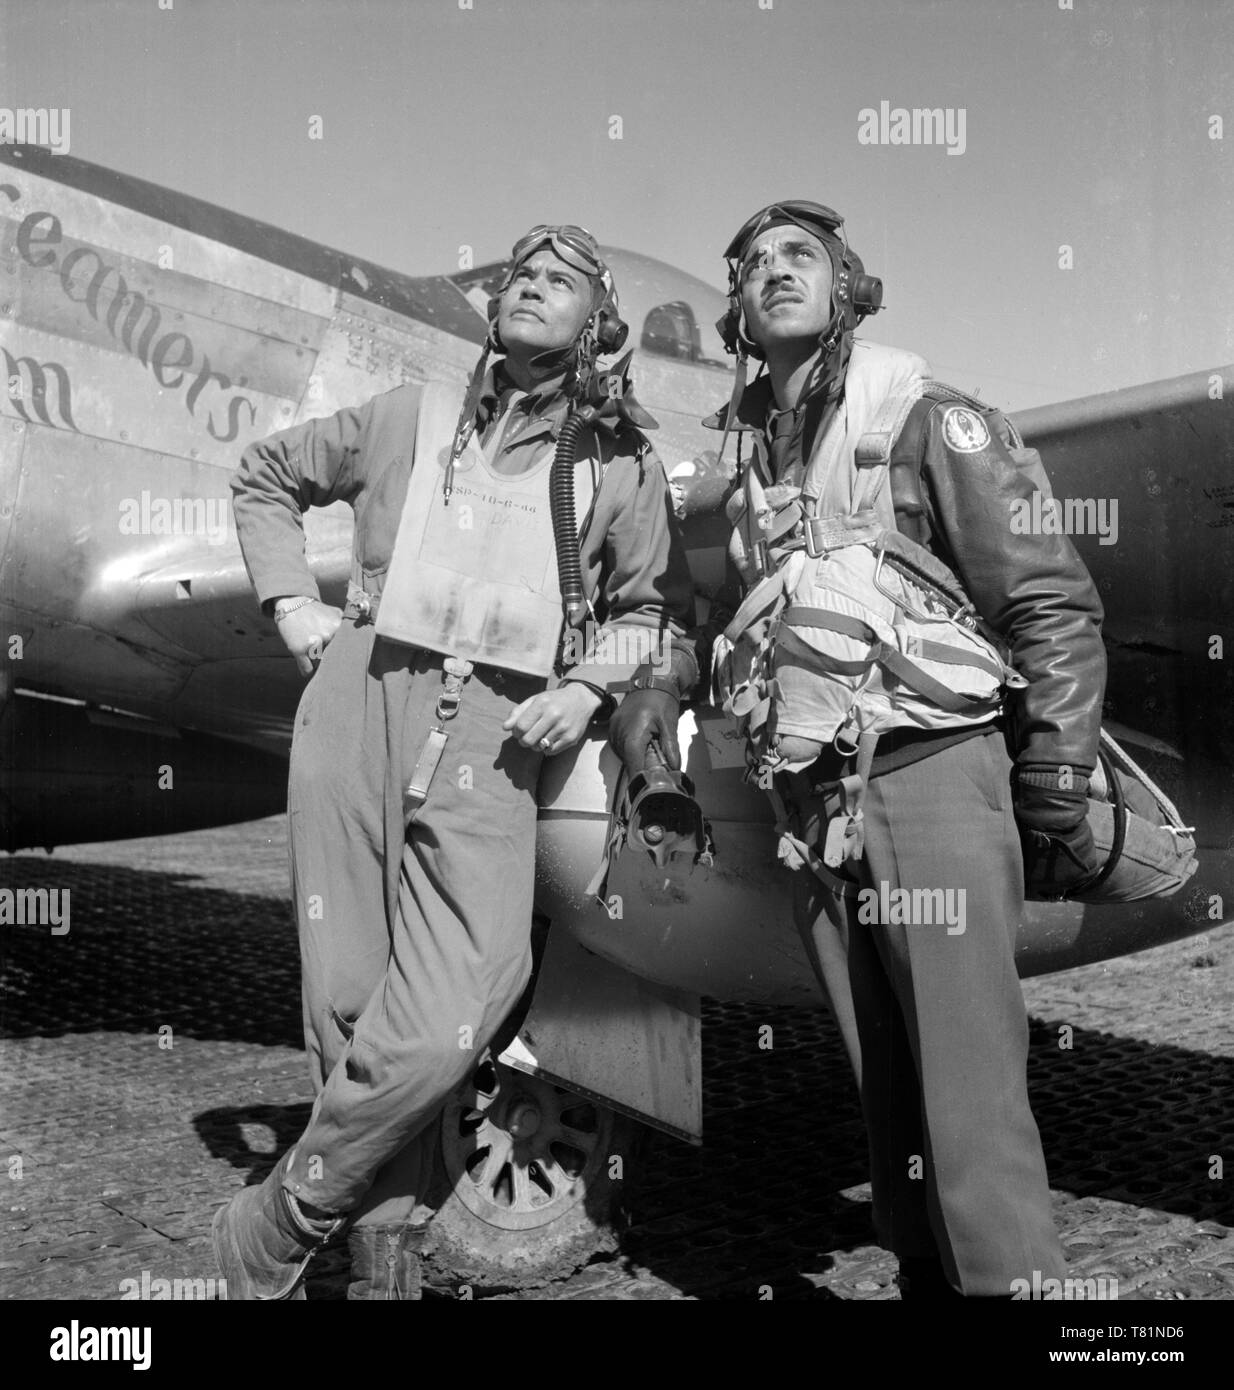 La DEUXIÈME GUERRE MONDIALE, le colonel Benjamin O. Davis et M. Gleed Tuskegee Airman, 1945 Photo Stock